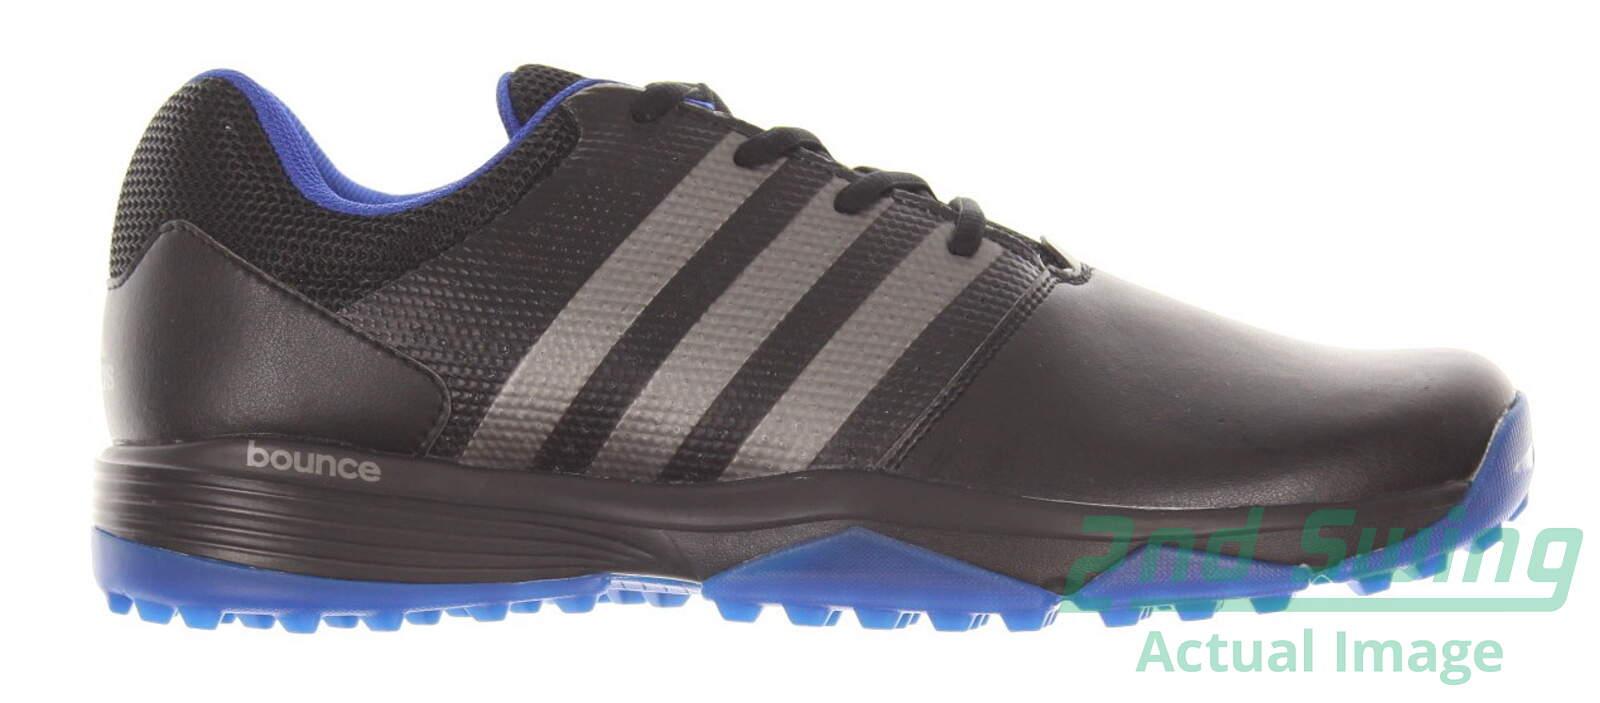 48deabee2 New Mens Golf Shoe Adidas 360 Traxion Medium 11.5 Black MSRP  80 - Golf  Footwear